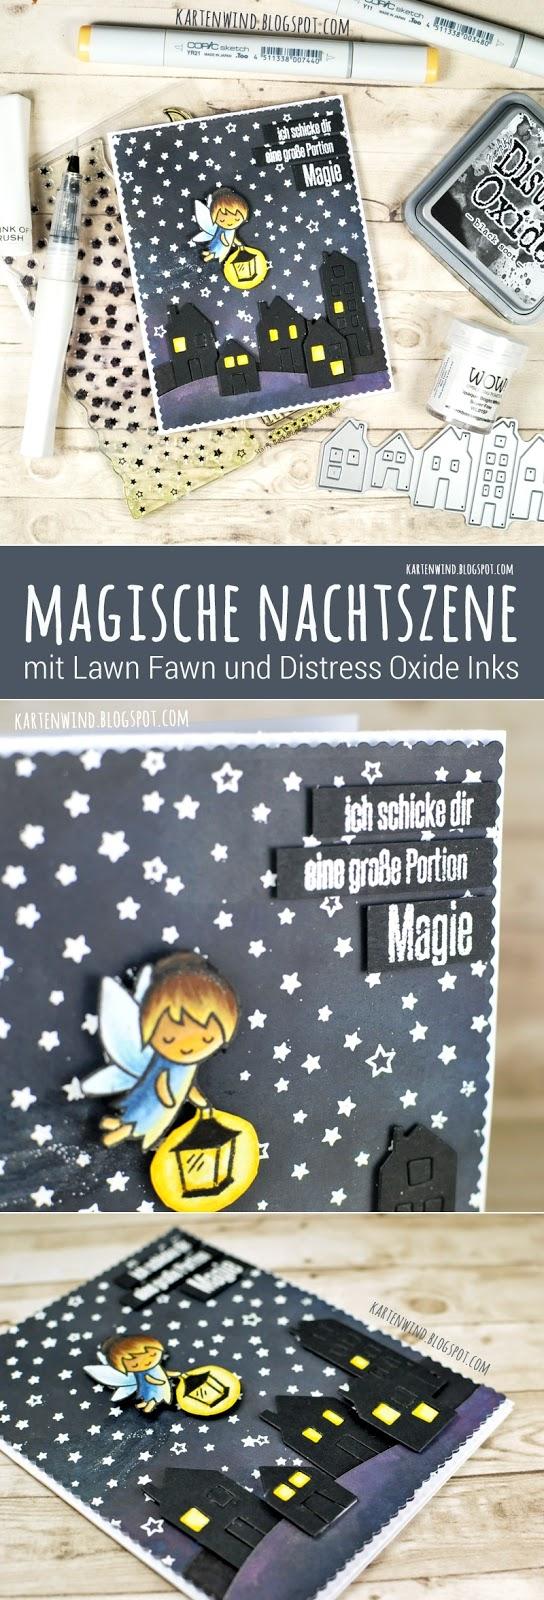 https://kartenwind.blogspot.com/2017/09/magische-nachtszenerie-mit-lawn-fawn-tim-holtz-distress-oxide-inks.html